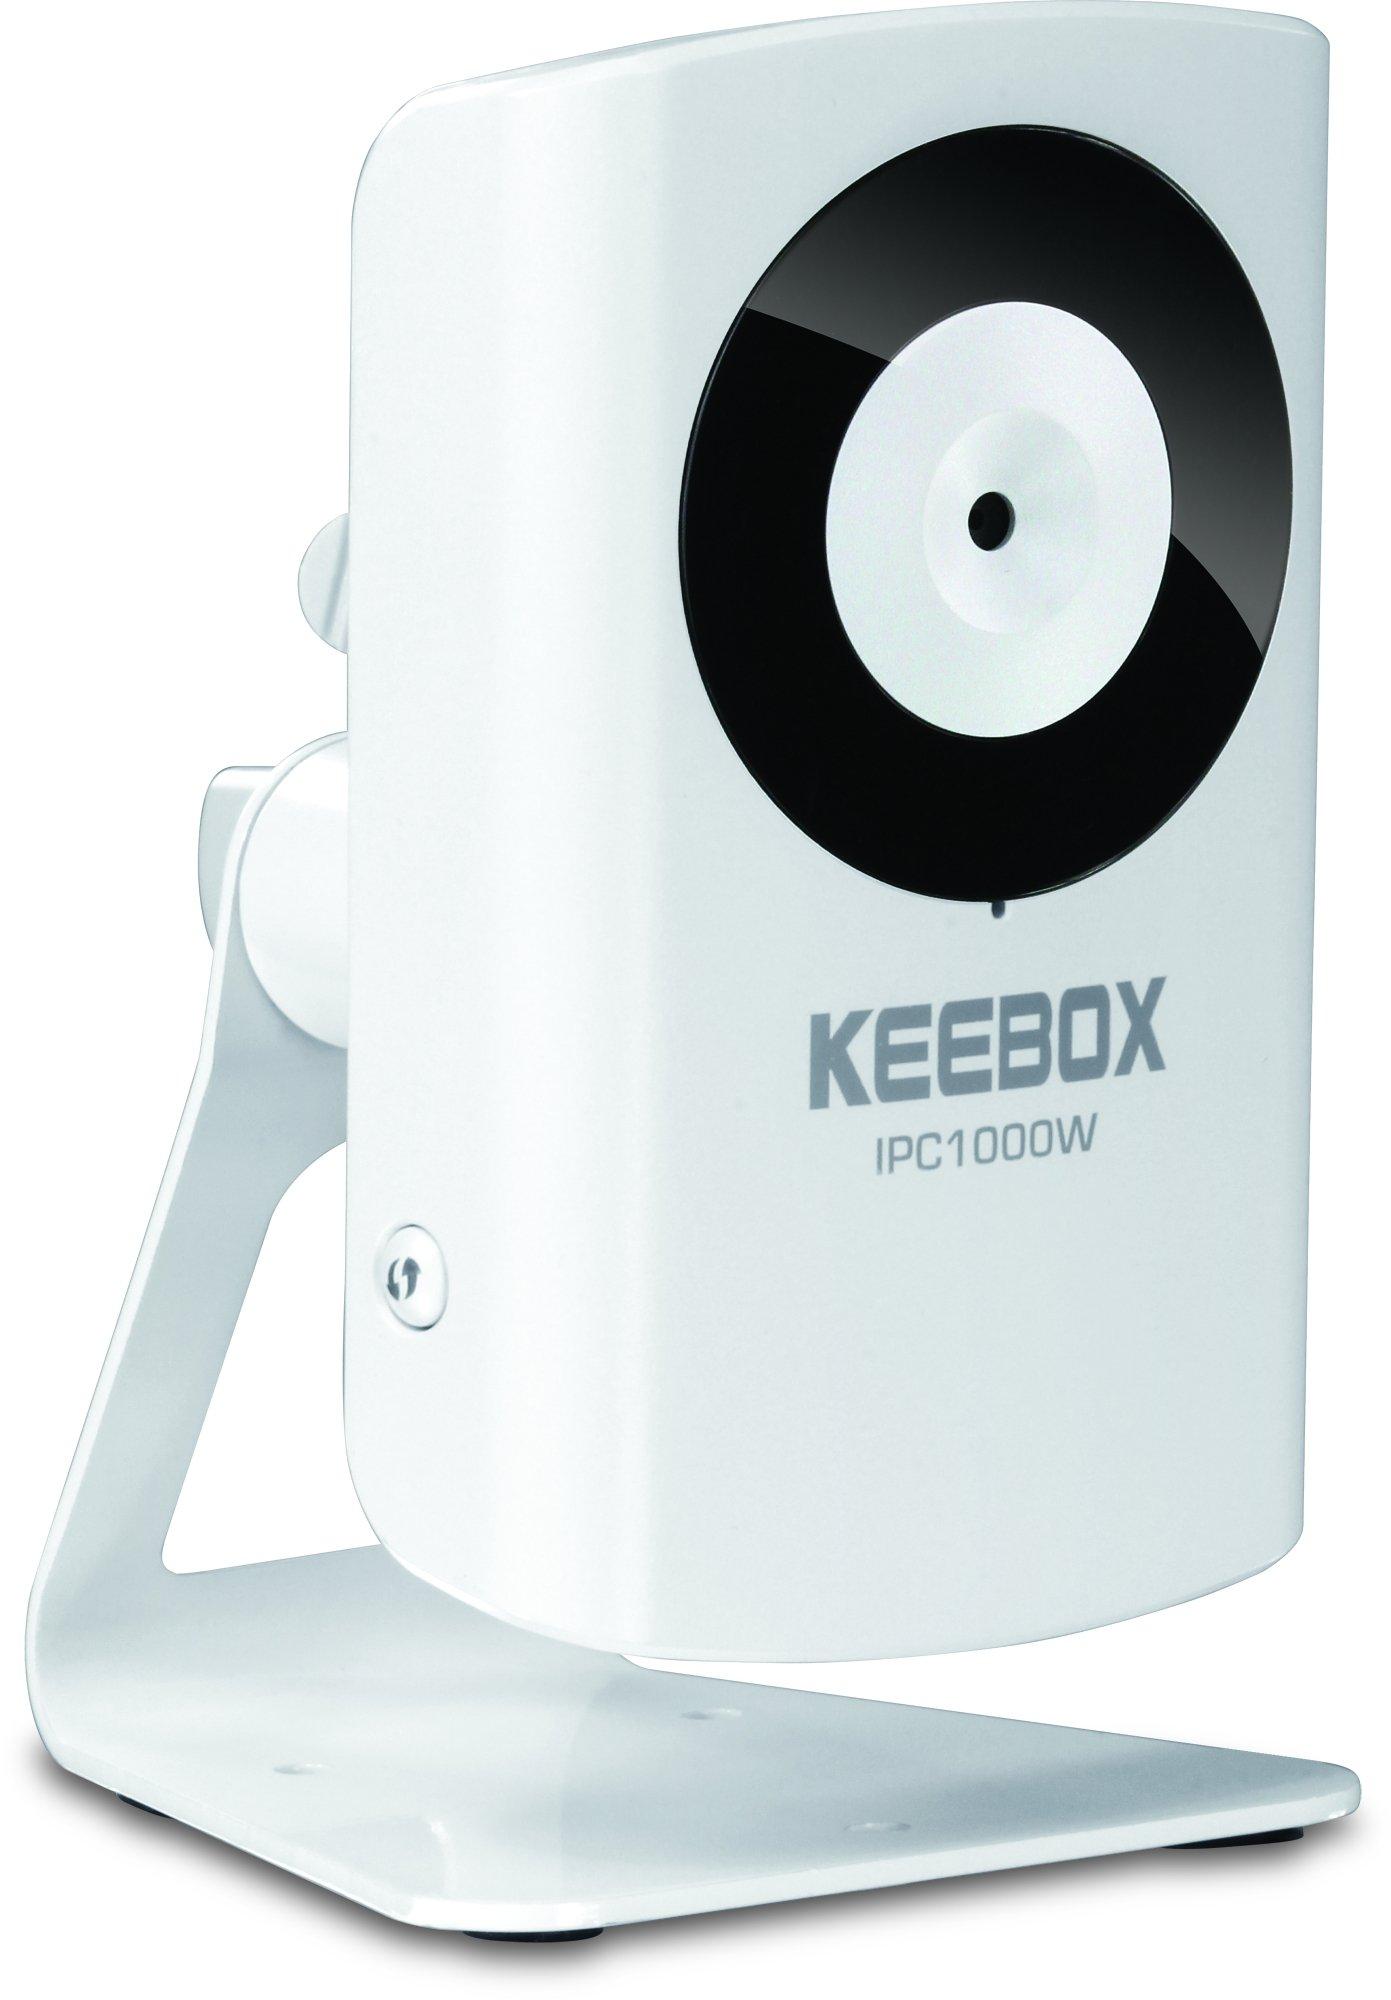 Keebox IPC1000W Surveillance/Network Camera - Color